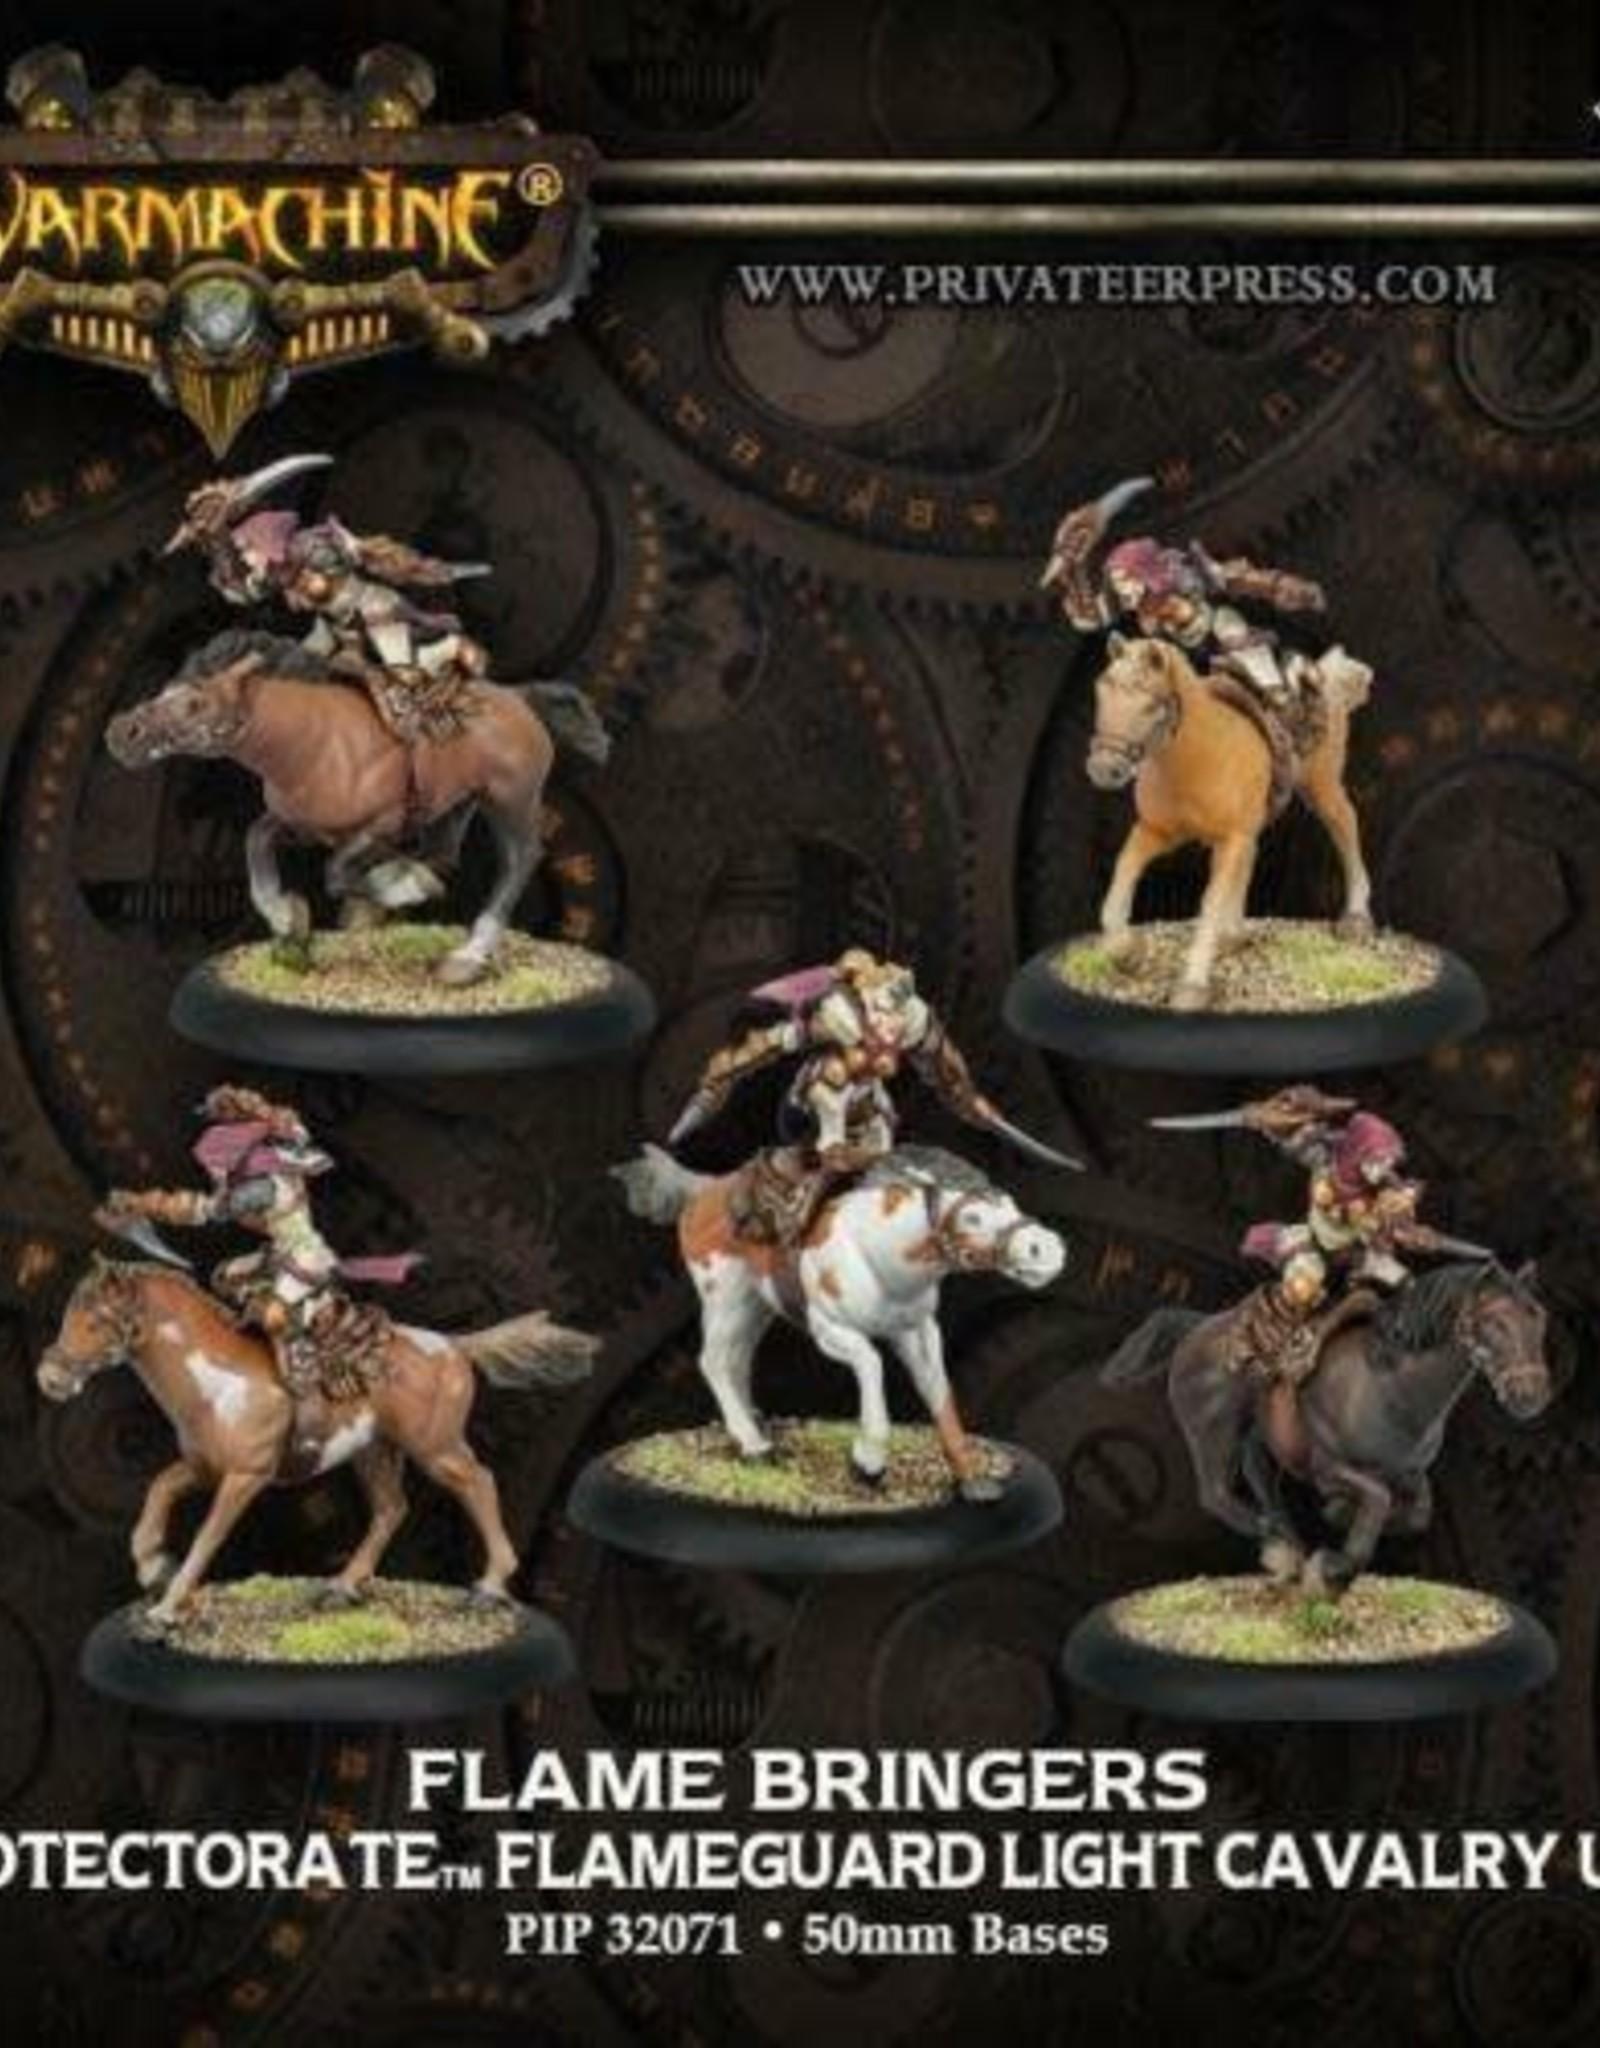 Warmachine Protectorate - Flame Bringers